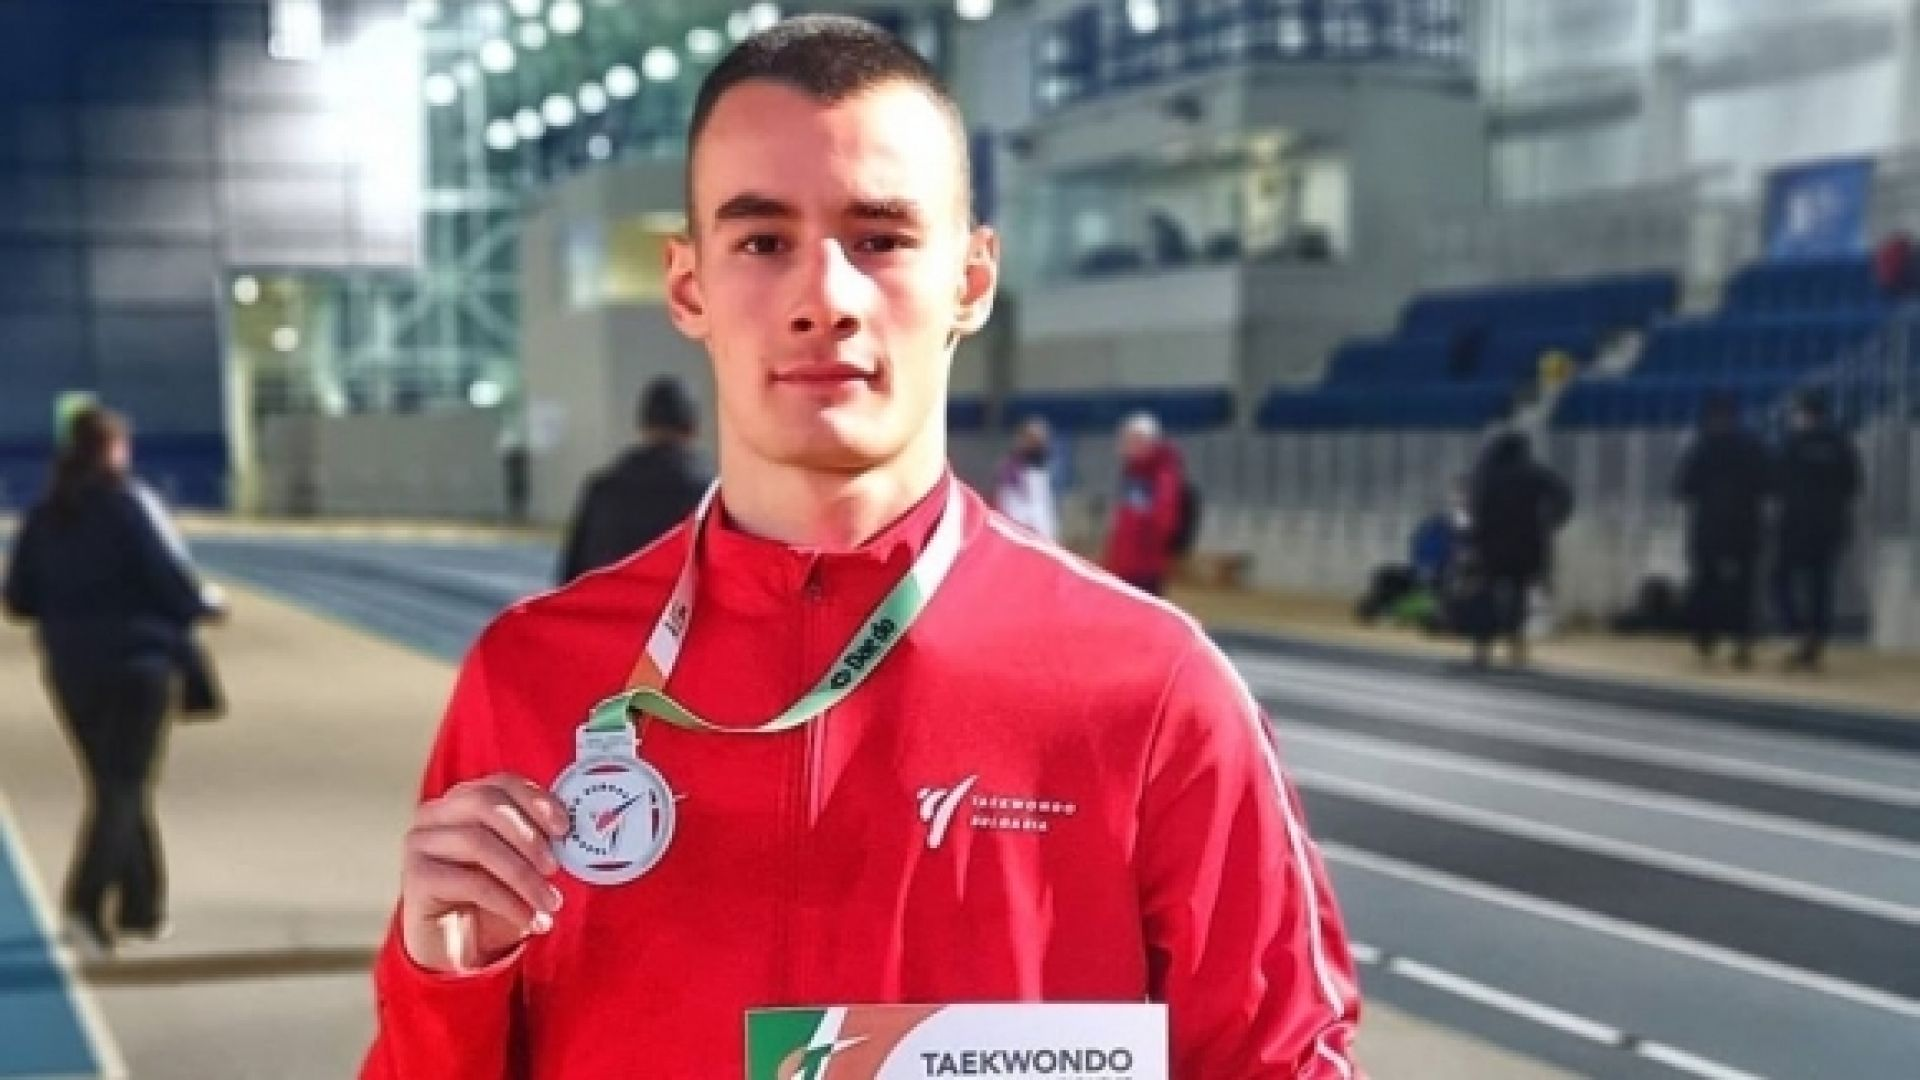 Българин стана европейски вицешампион по олимпийско таекуондо